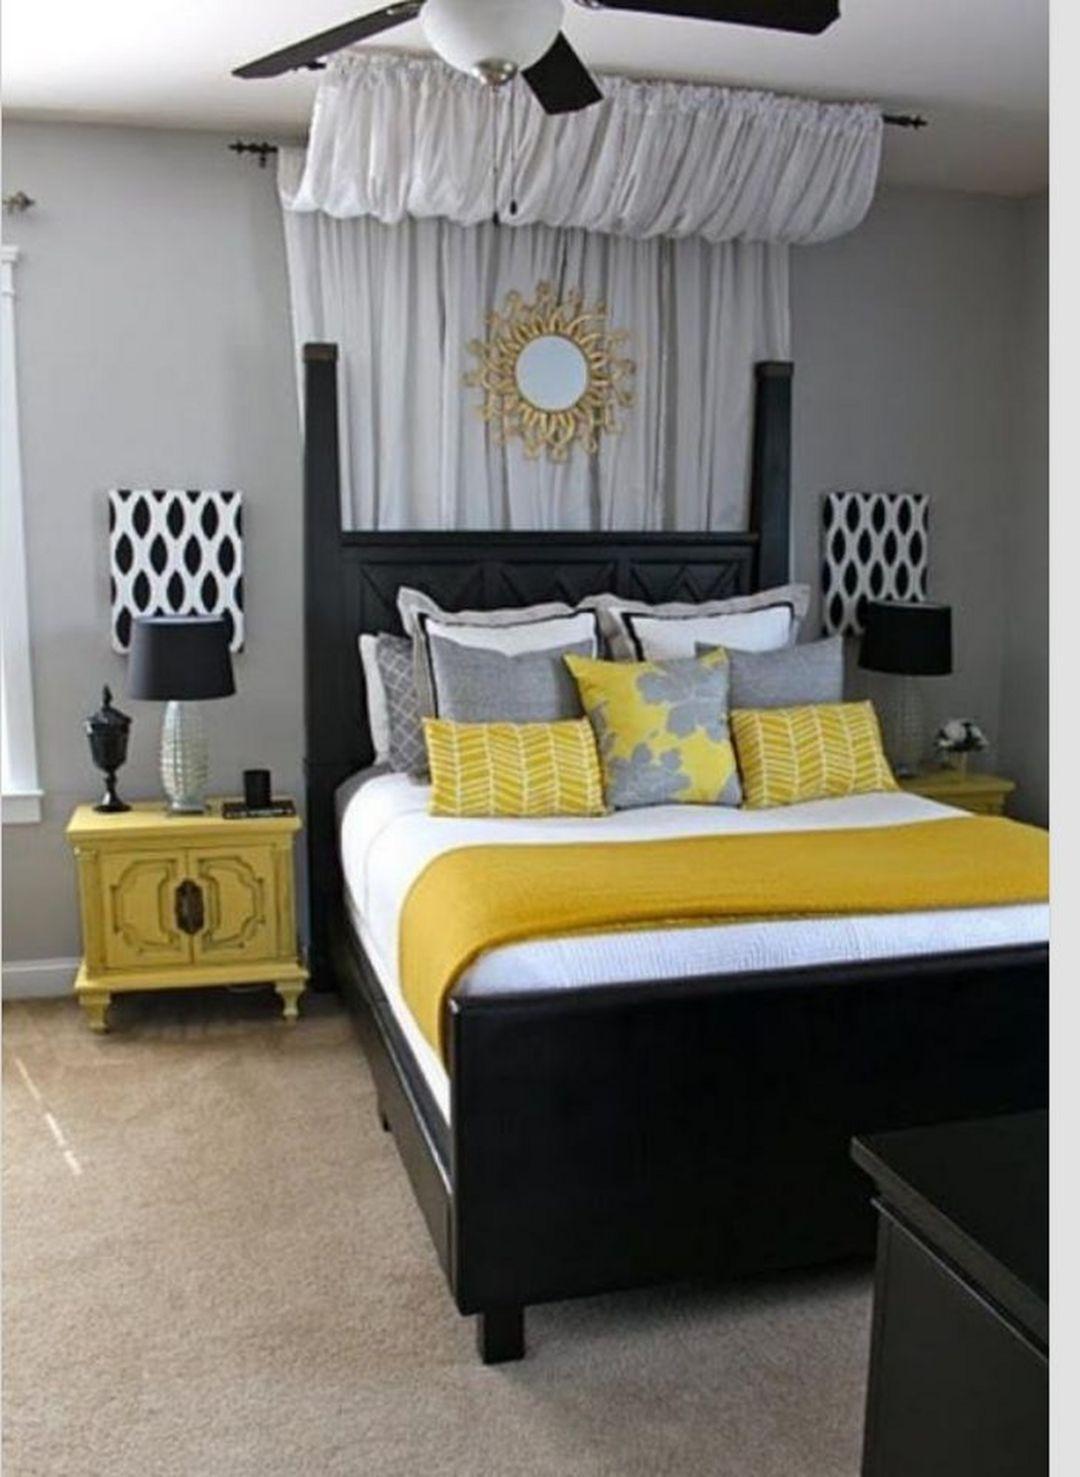 Sunflower Bedroom Decoration Ideas 017 | Home bedroom ...